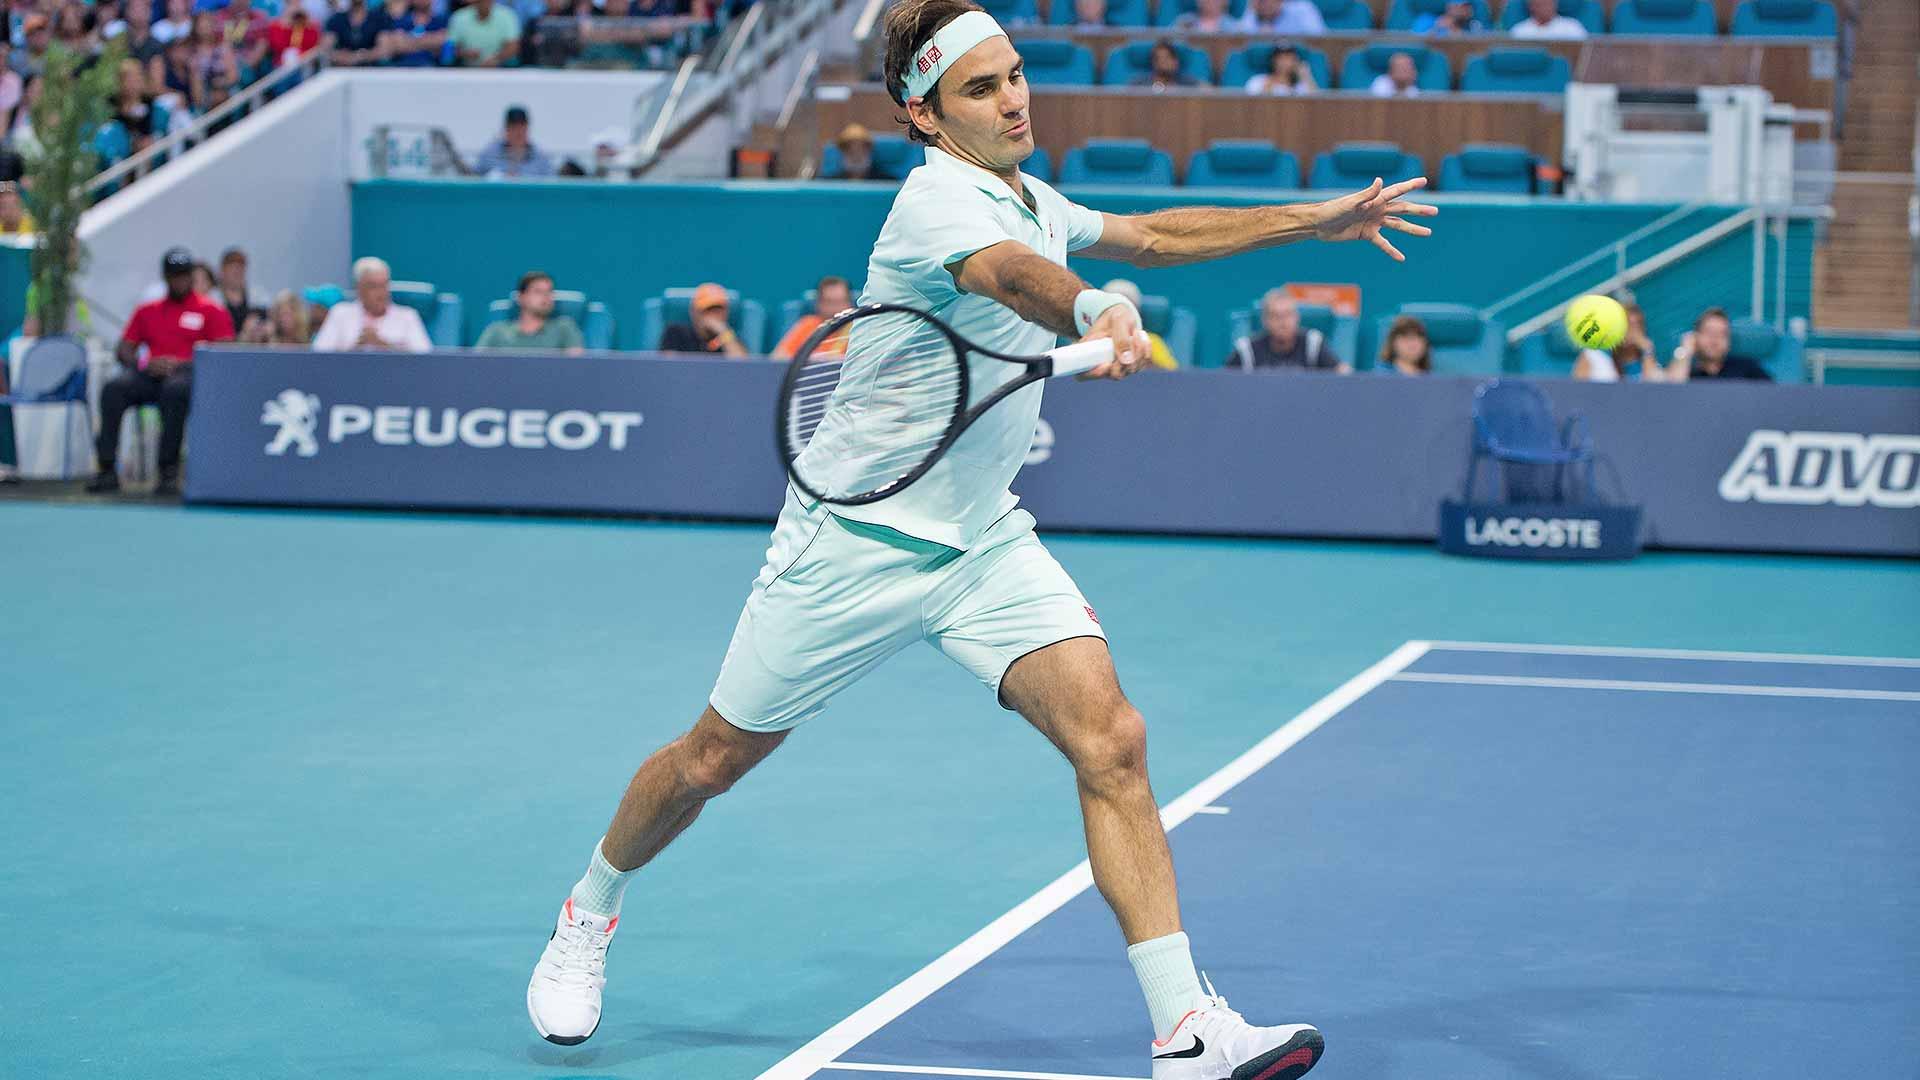 Federer Miami 2R 19